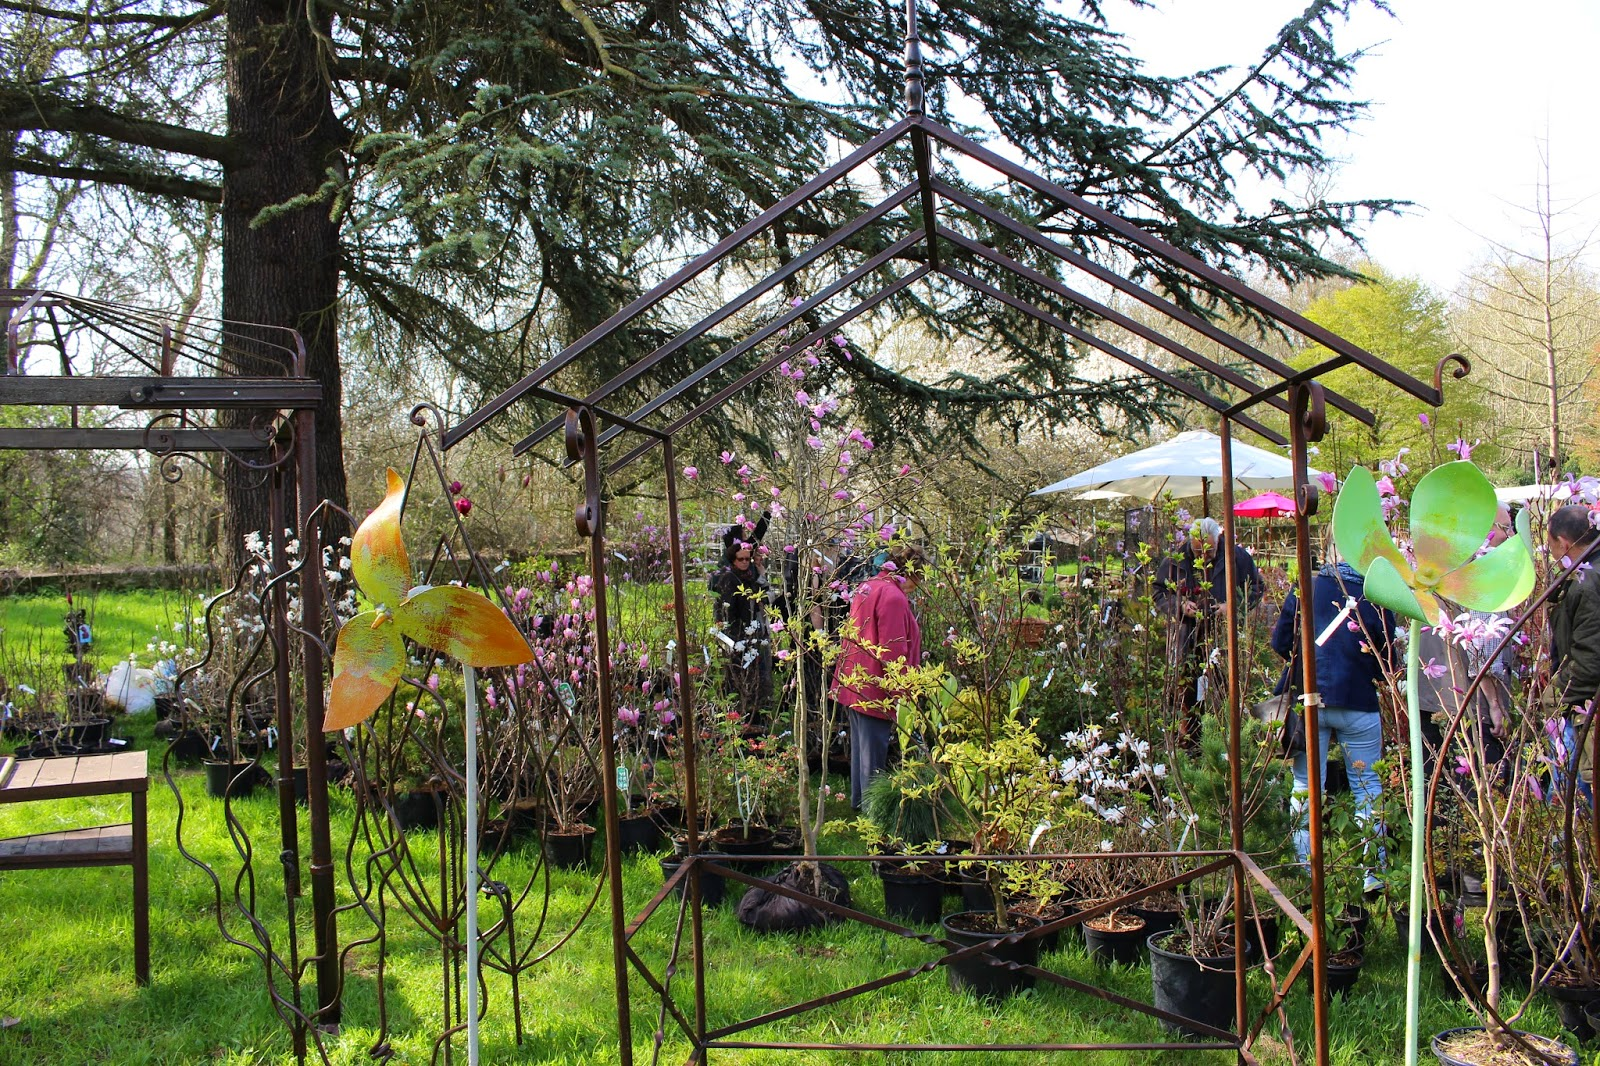 notre jardin secret st jean de beauregard 10 avril 2015